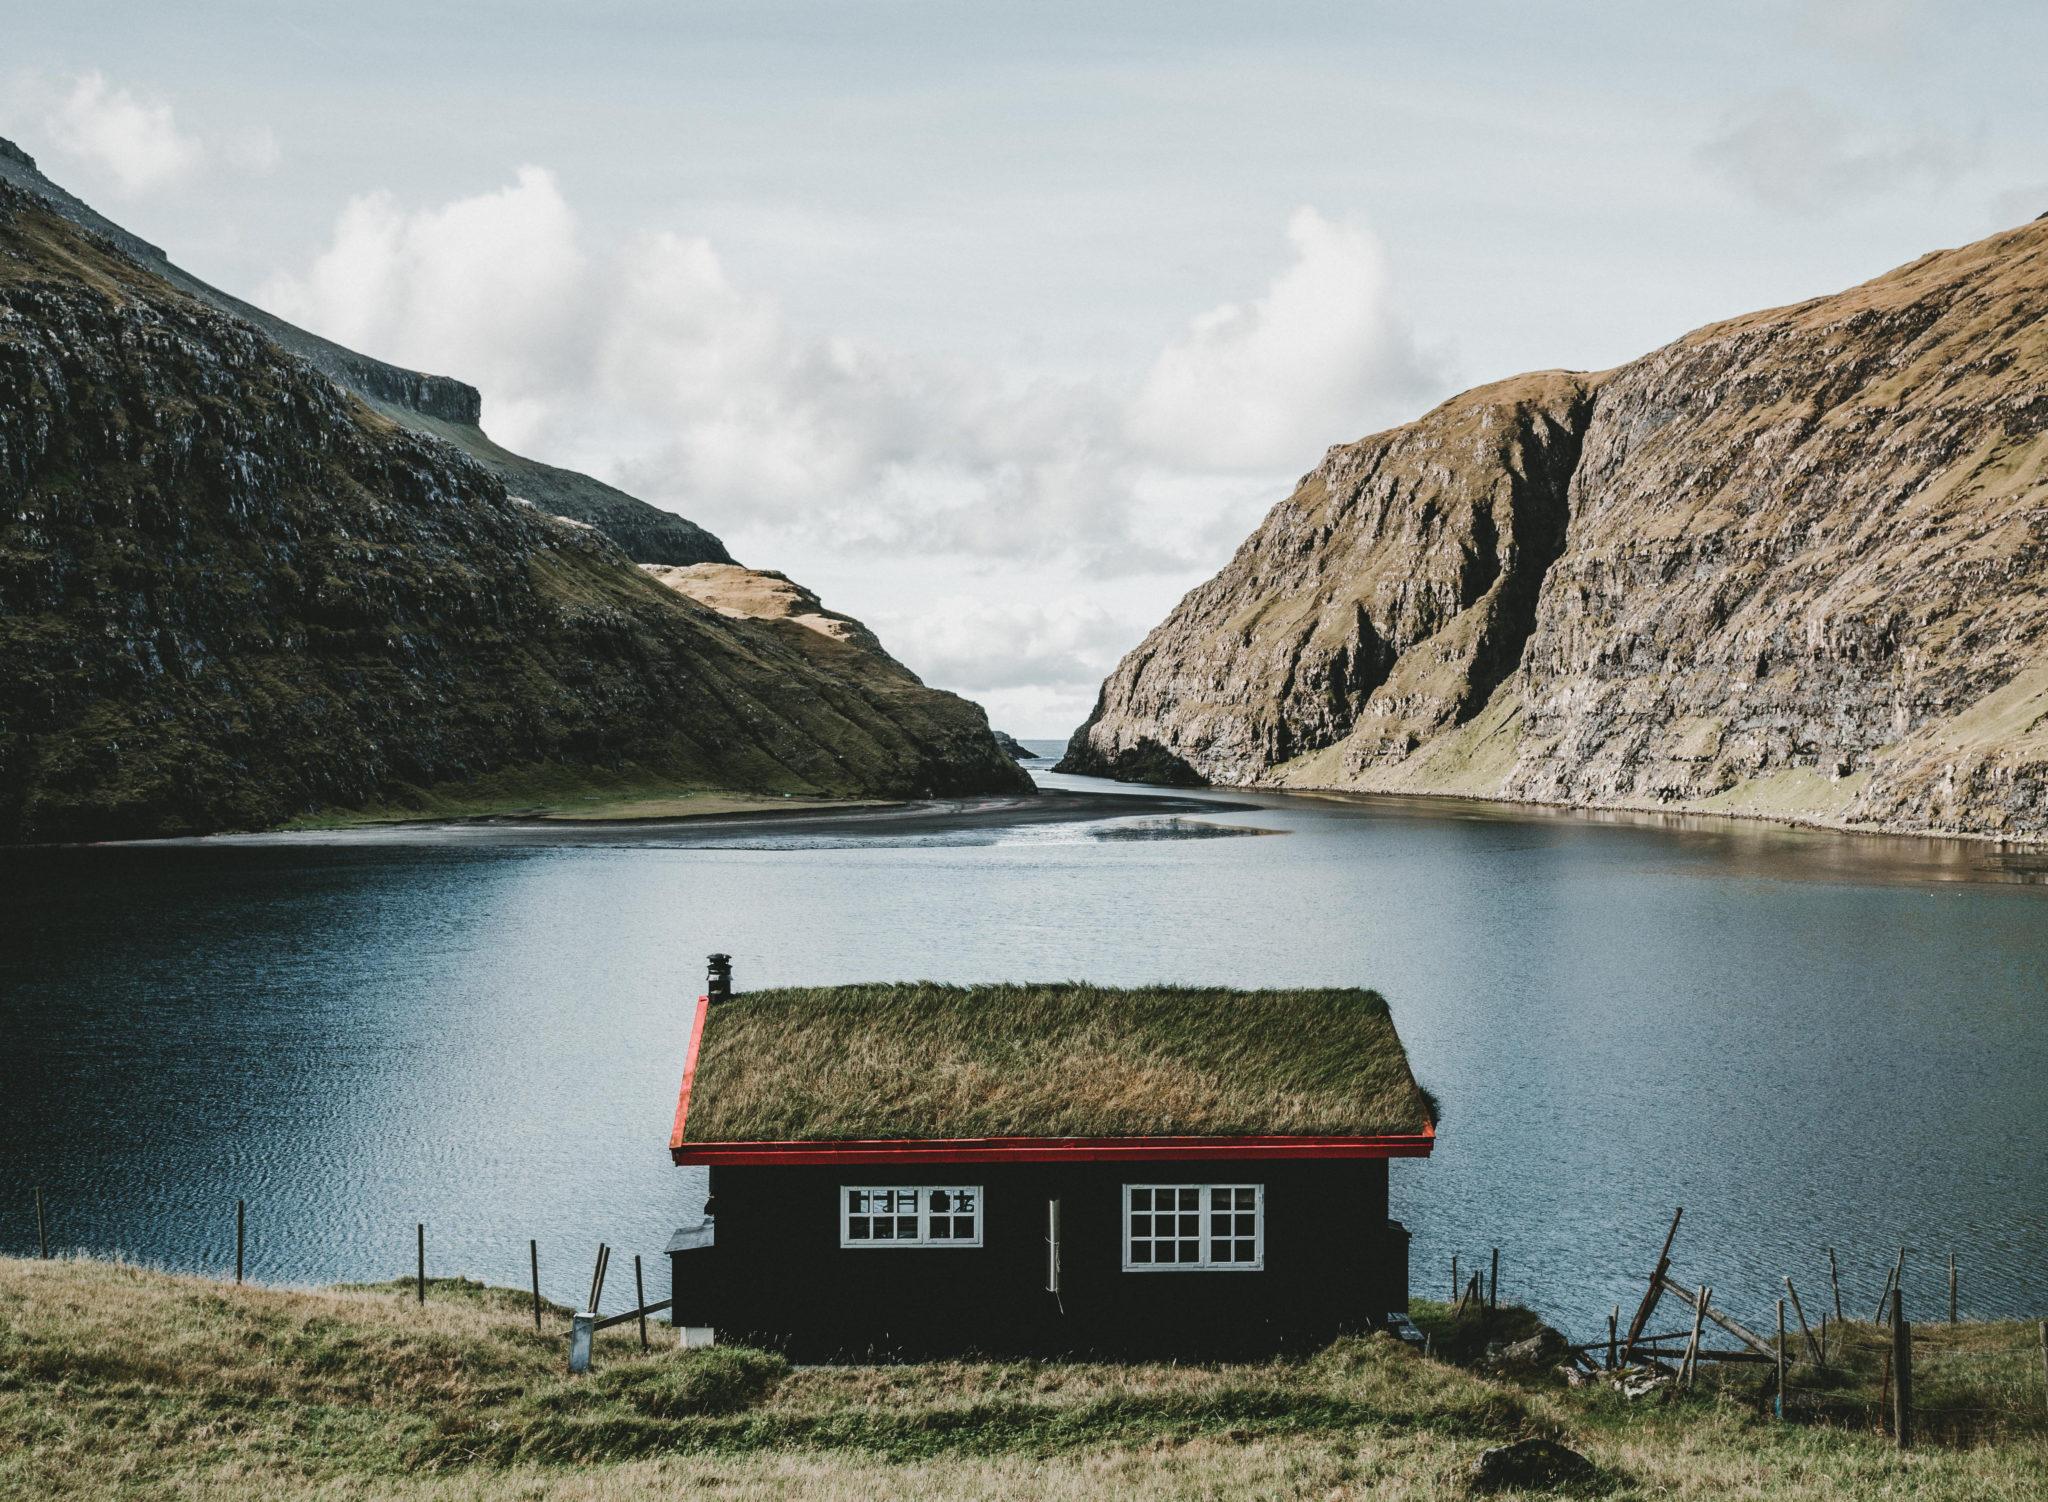 Chata na Faerských ostrovech